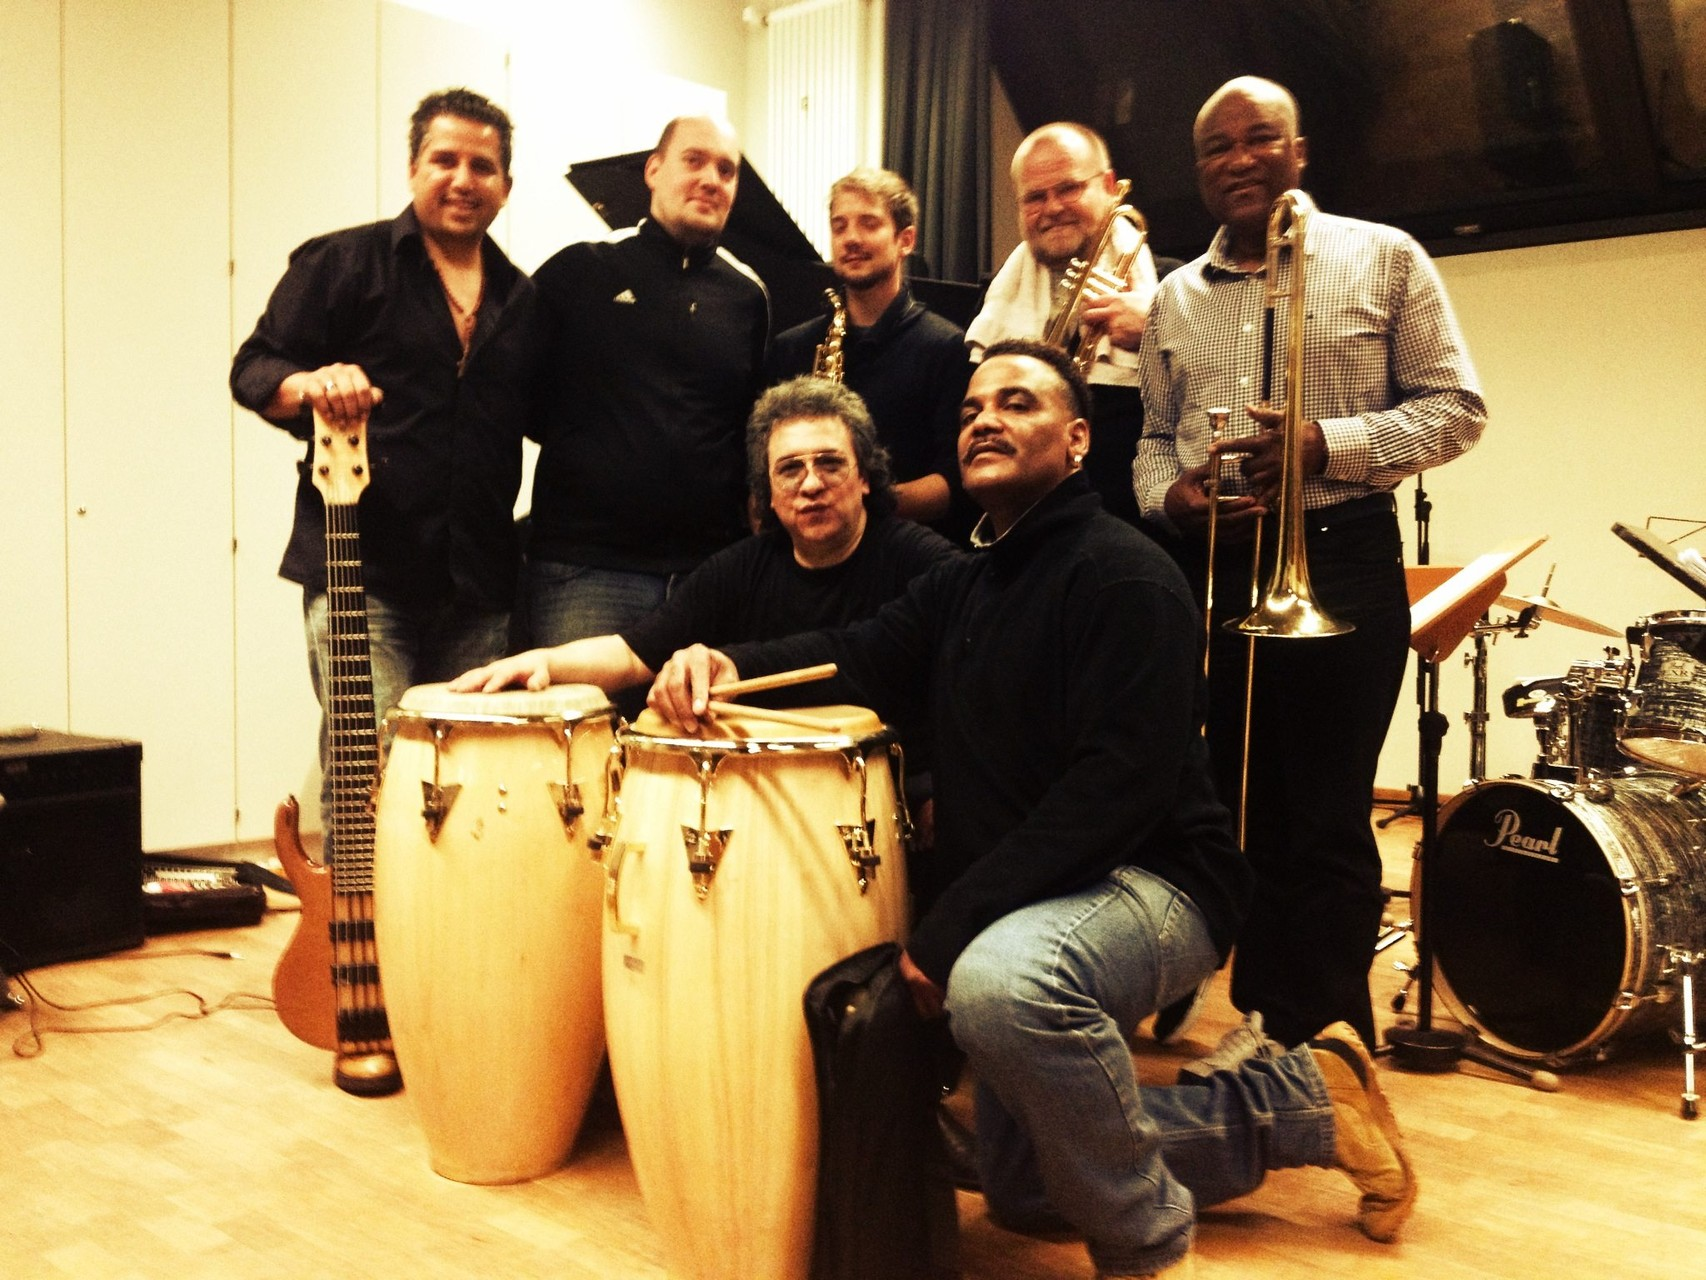 Rafaelito's Latin Jazz Projekt